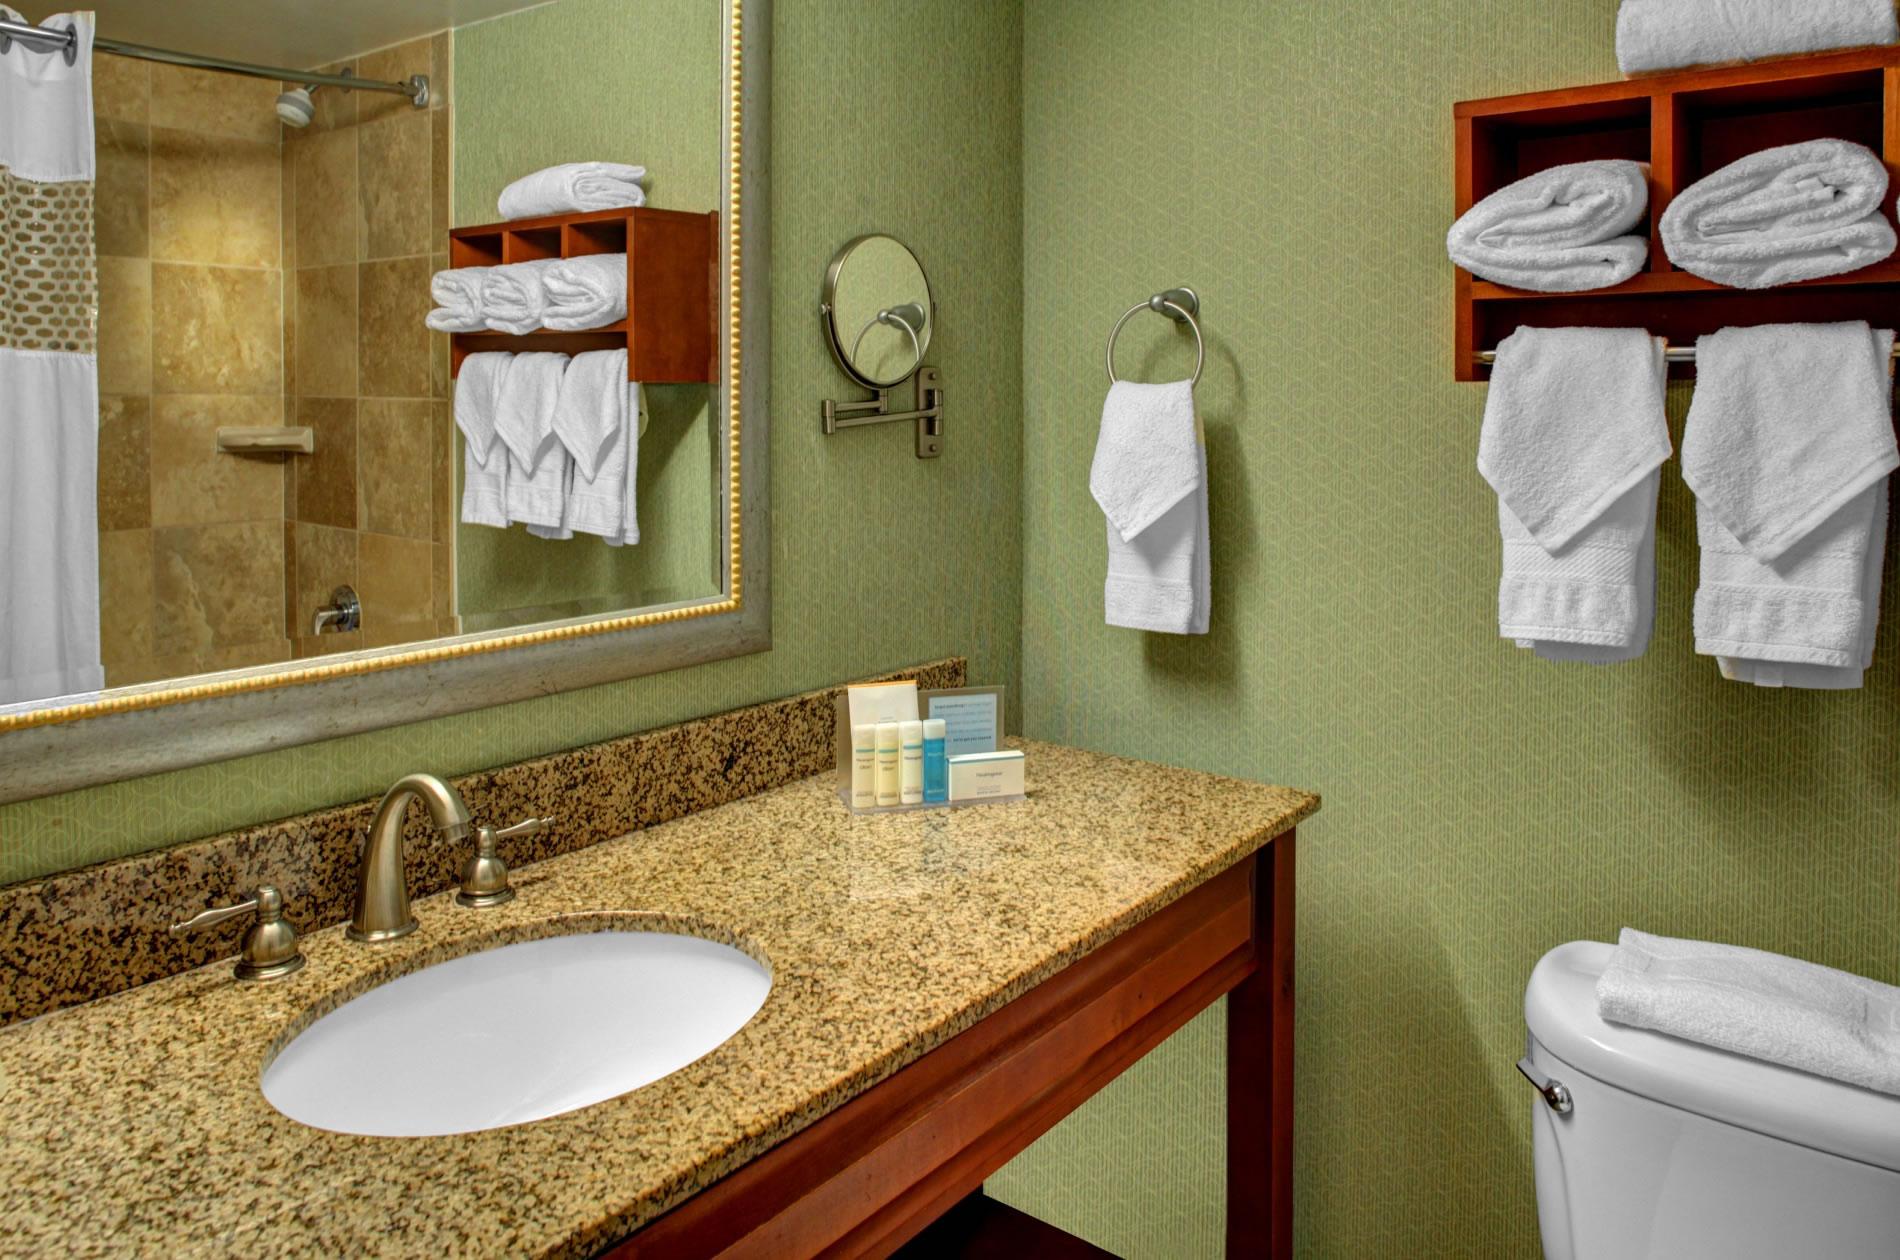 Hampton Inn by Hilton Coconut Grove Coral Gables Miami image 9